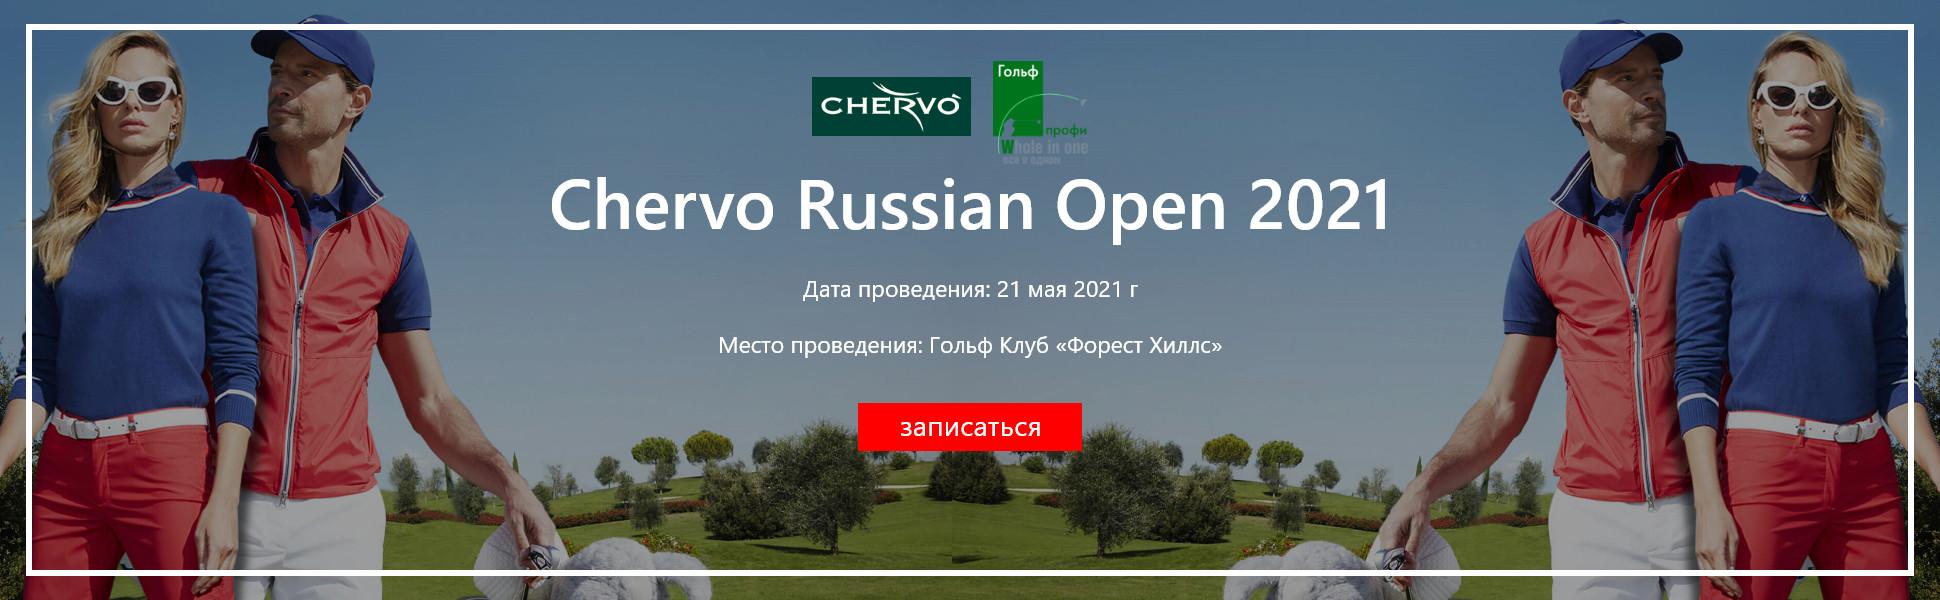 Chervo_Russian_open-2021